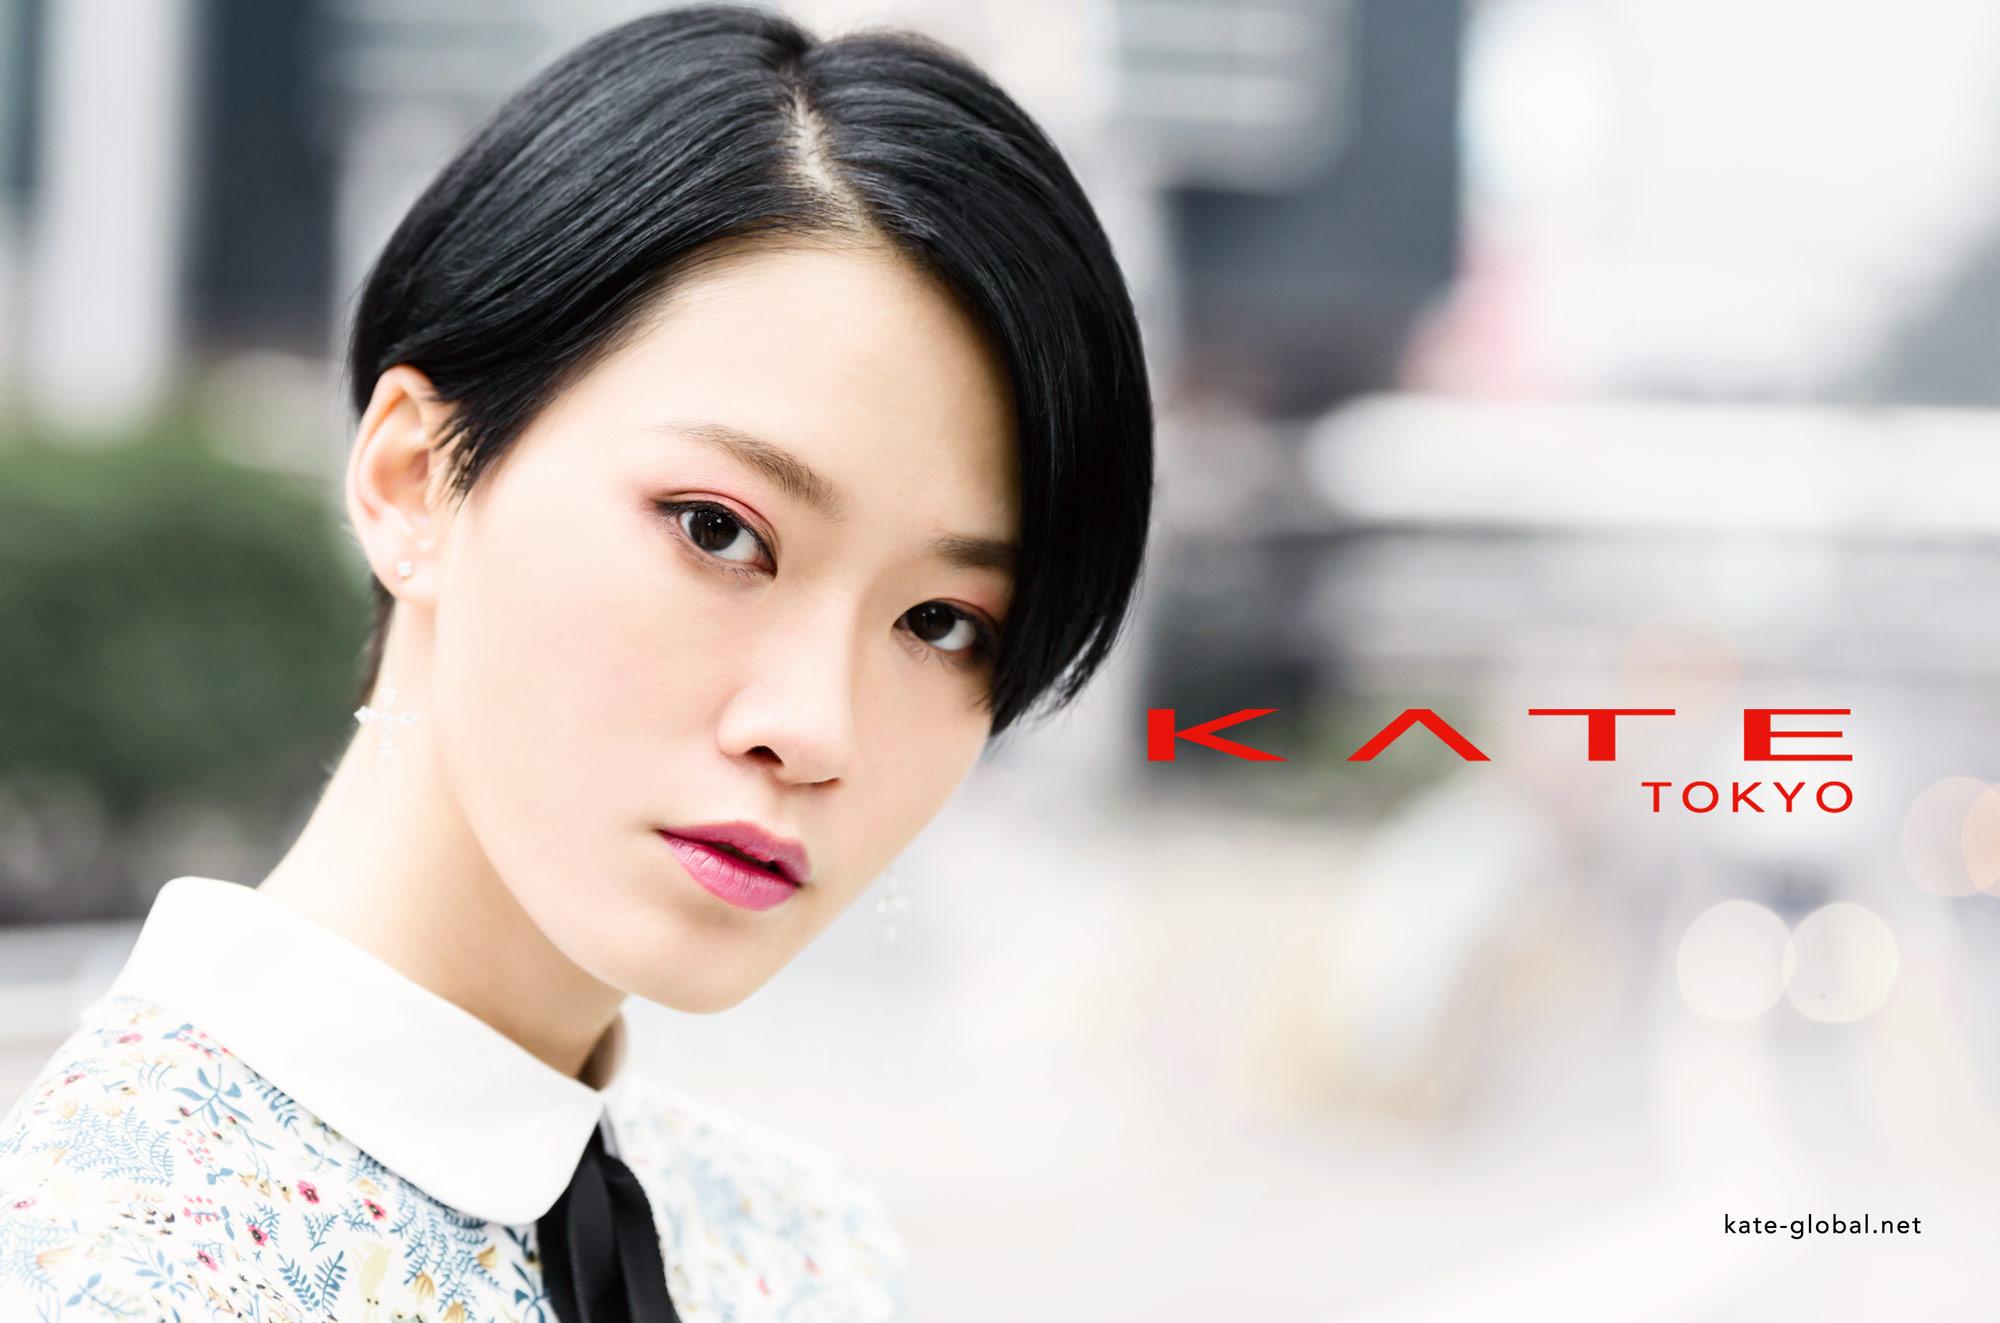 KateTokyo-FishLiew-01-Web.jpg